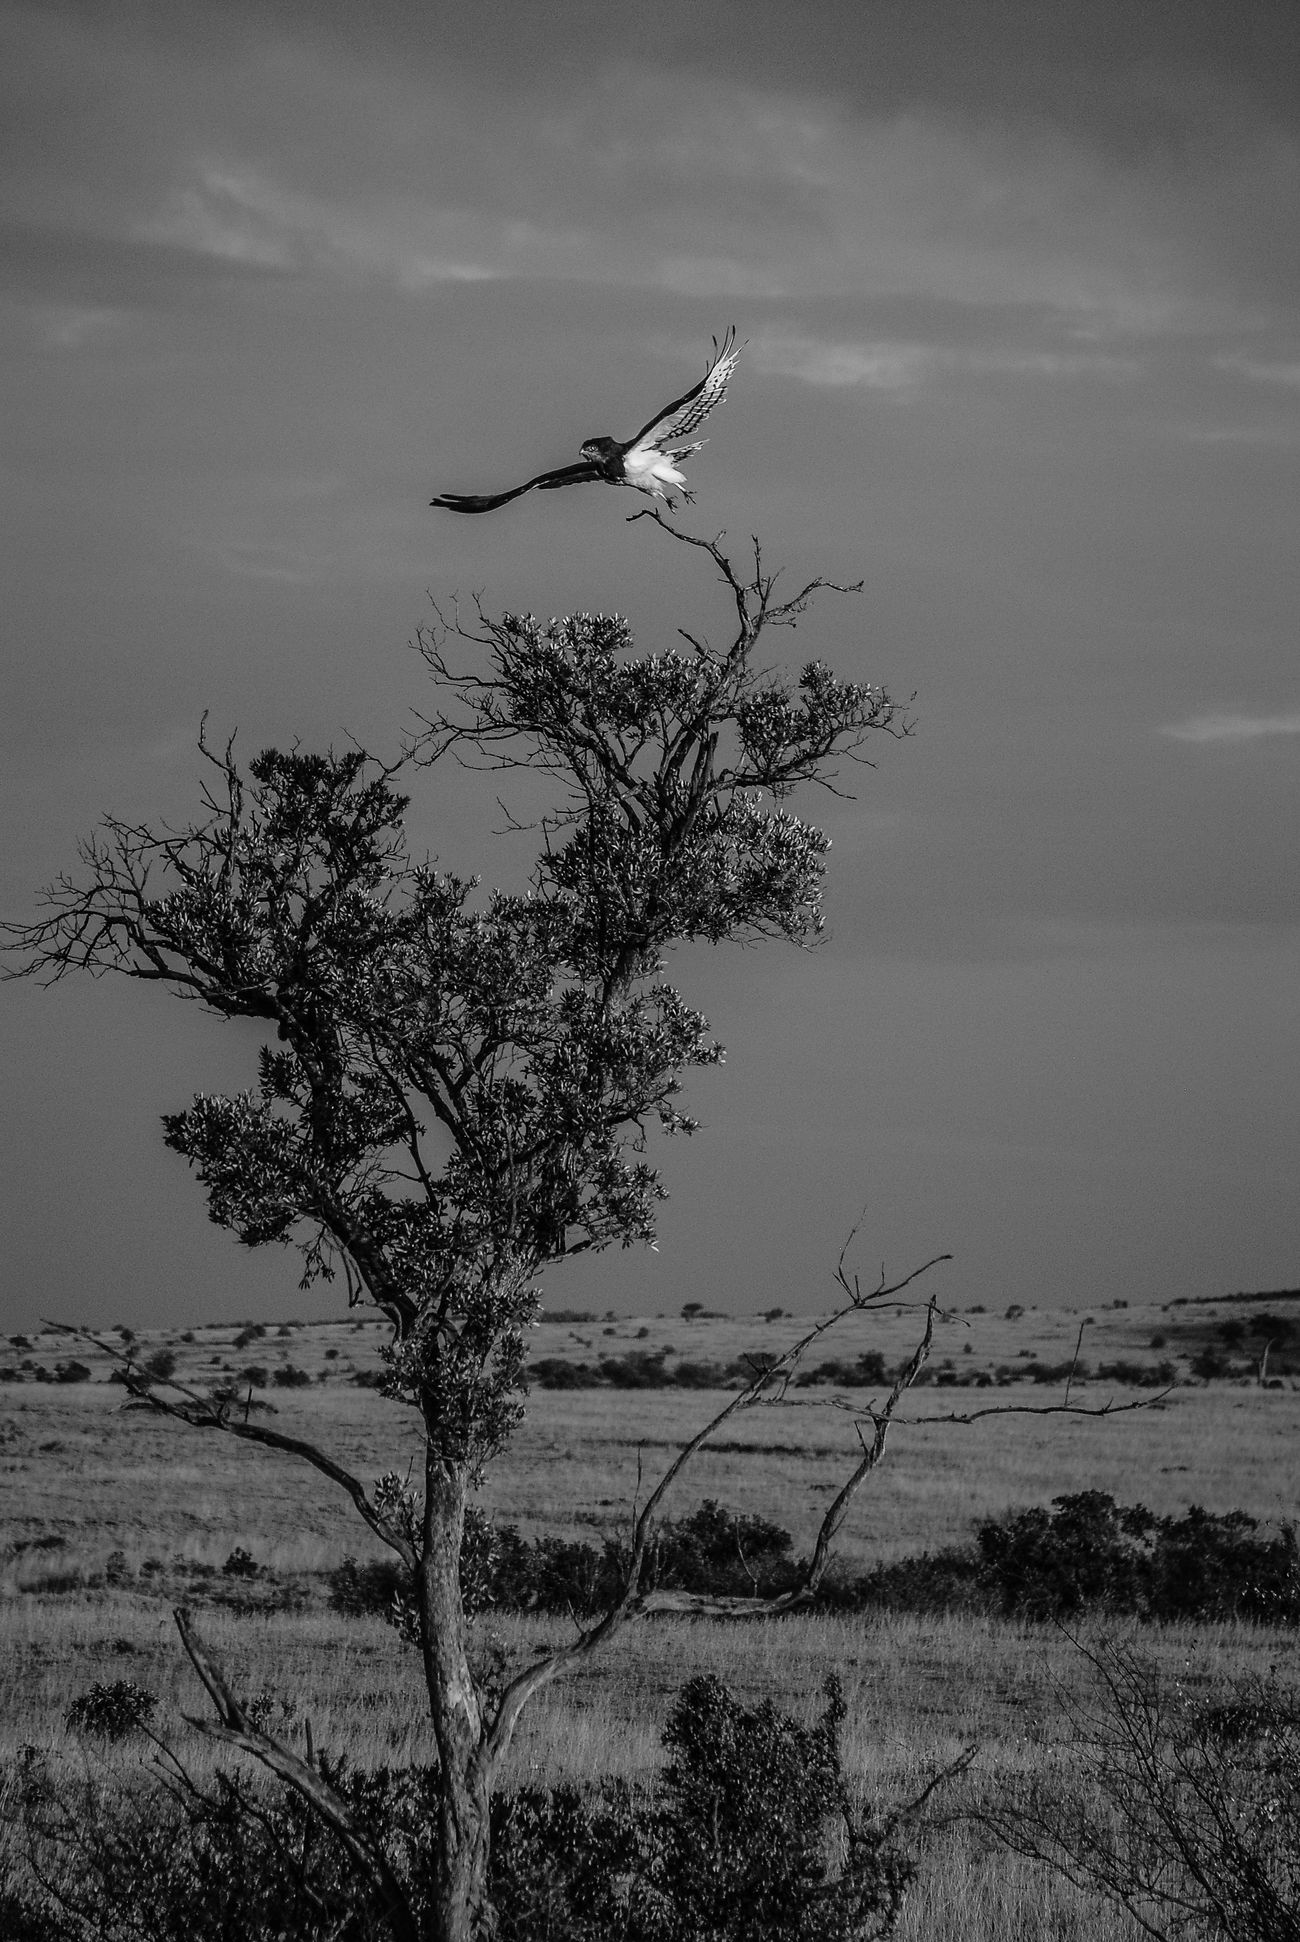 Snake eagle, Maasai Mara. Animal Wildlife Wildlife Wildlife & Nature Wildlifephotography Maasai Mara Kenya Africa Travel Photography Travel Nikon Nikonphotographer Outdoors Animals In The Wild Blackandwhite Black & White Monochrome Landscape Nature Birdofprey Eagle Birdinflight